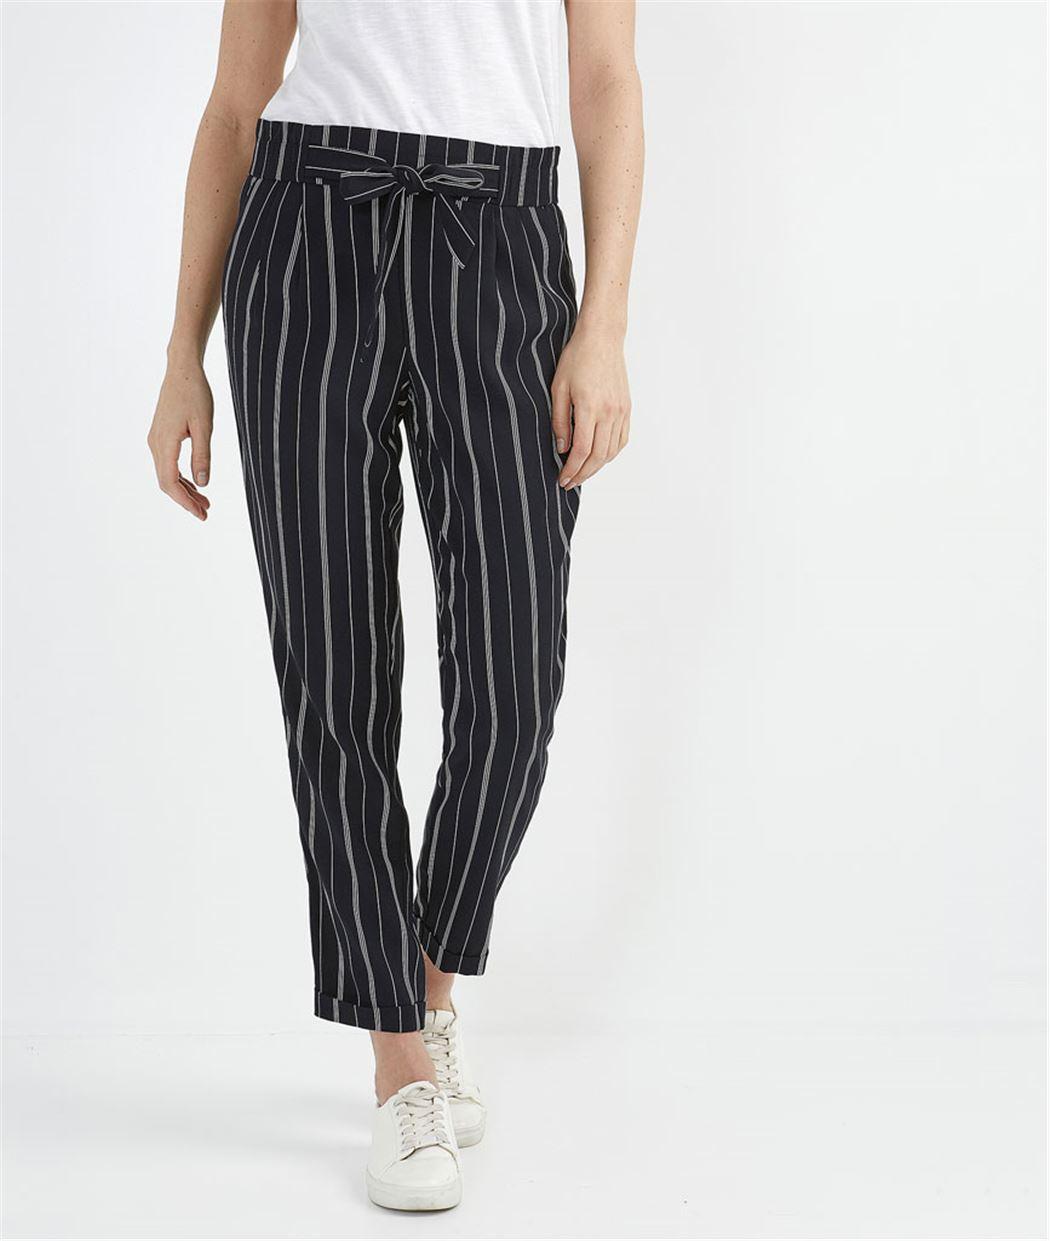 Pantalon femme fluide avec ceinture MARINE